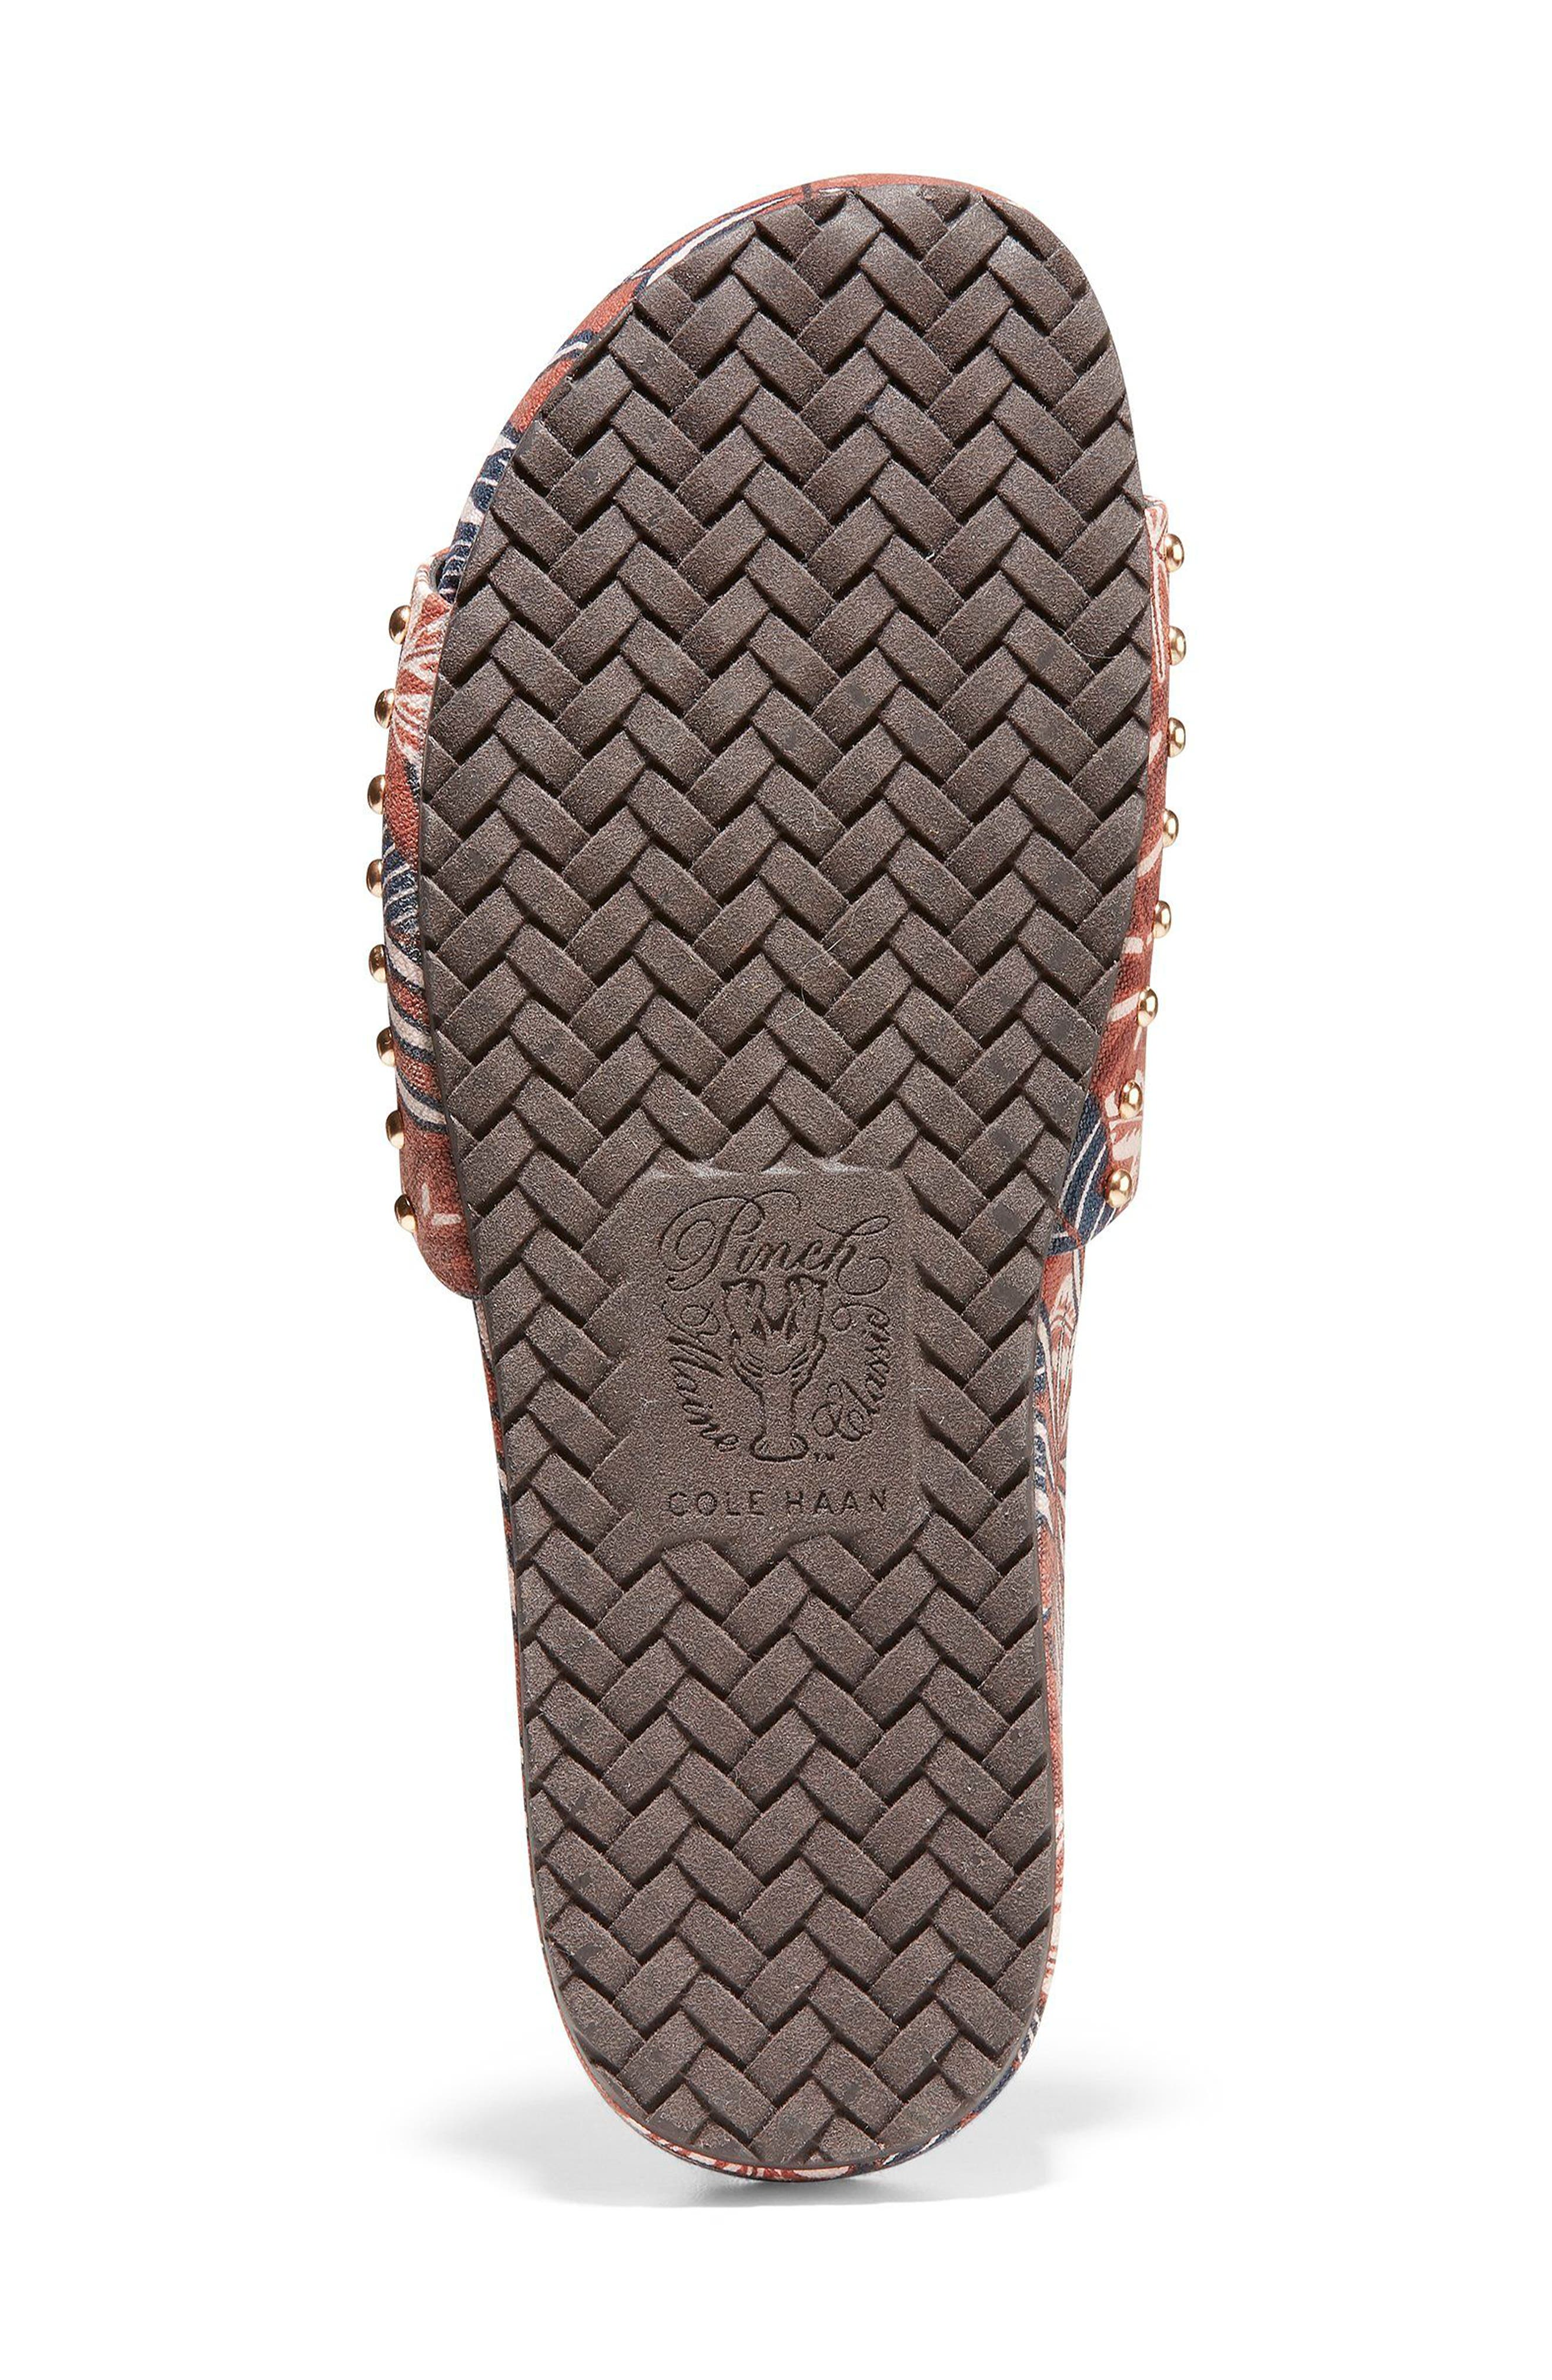 Pinch Montauk Print Slide Sandal,                             Alternate thumbnail 6, color,                             Tropical Palm Print Fabric